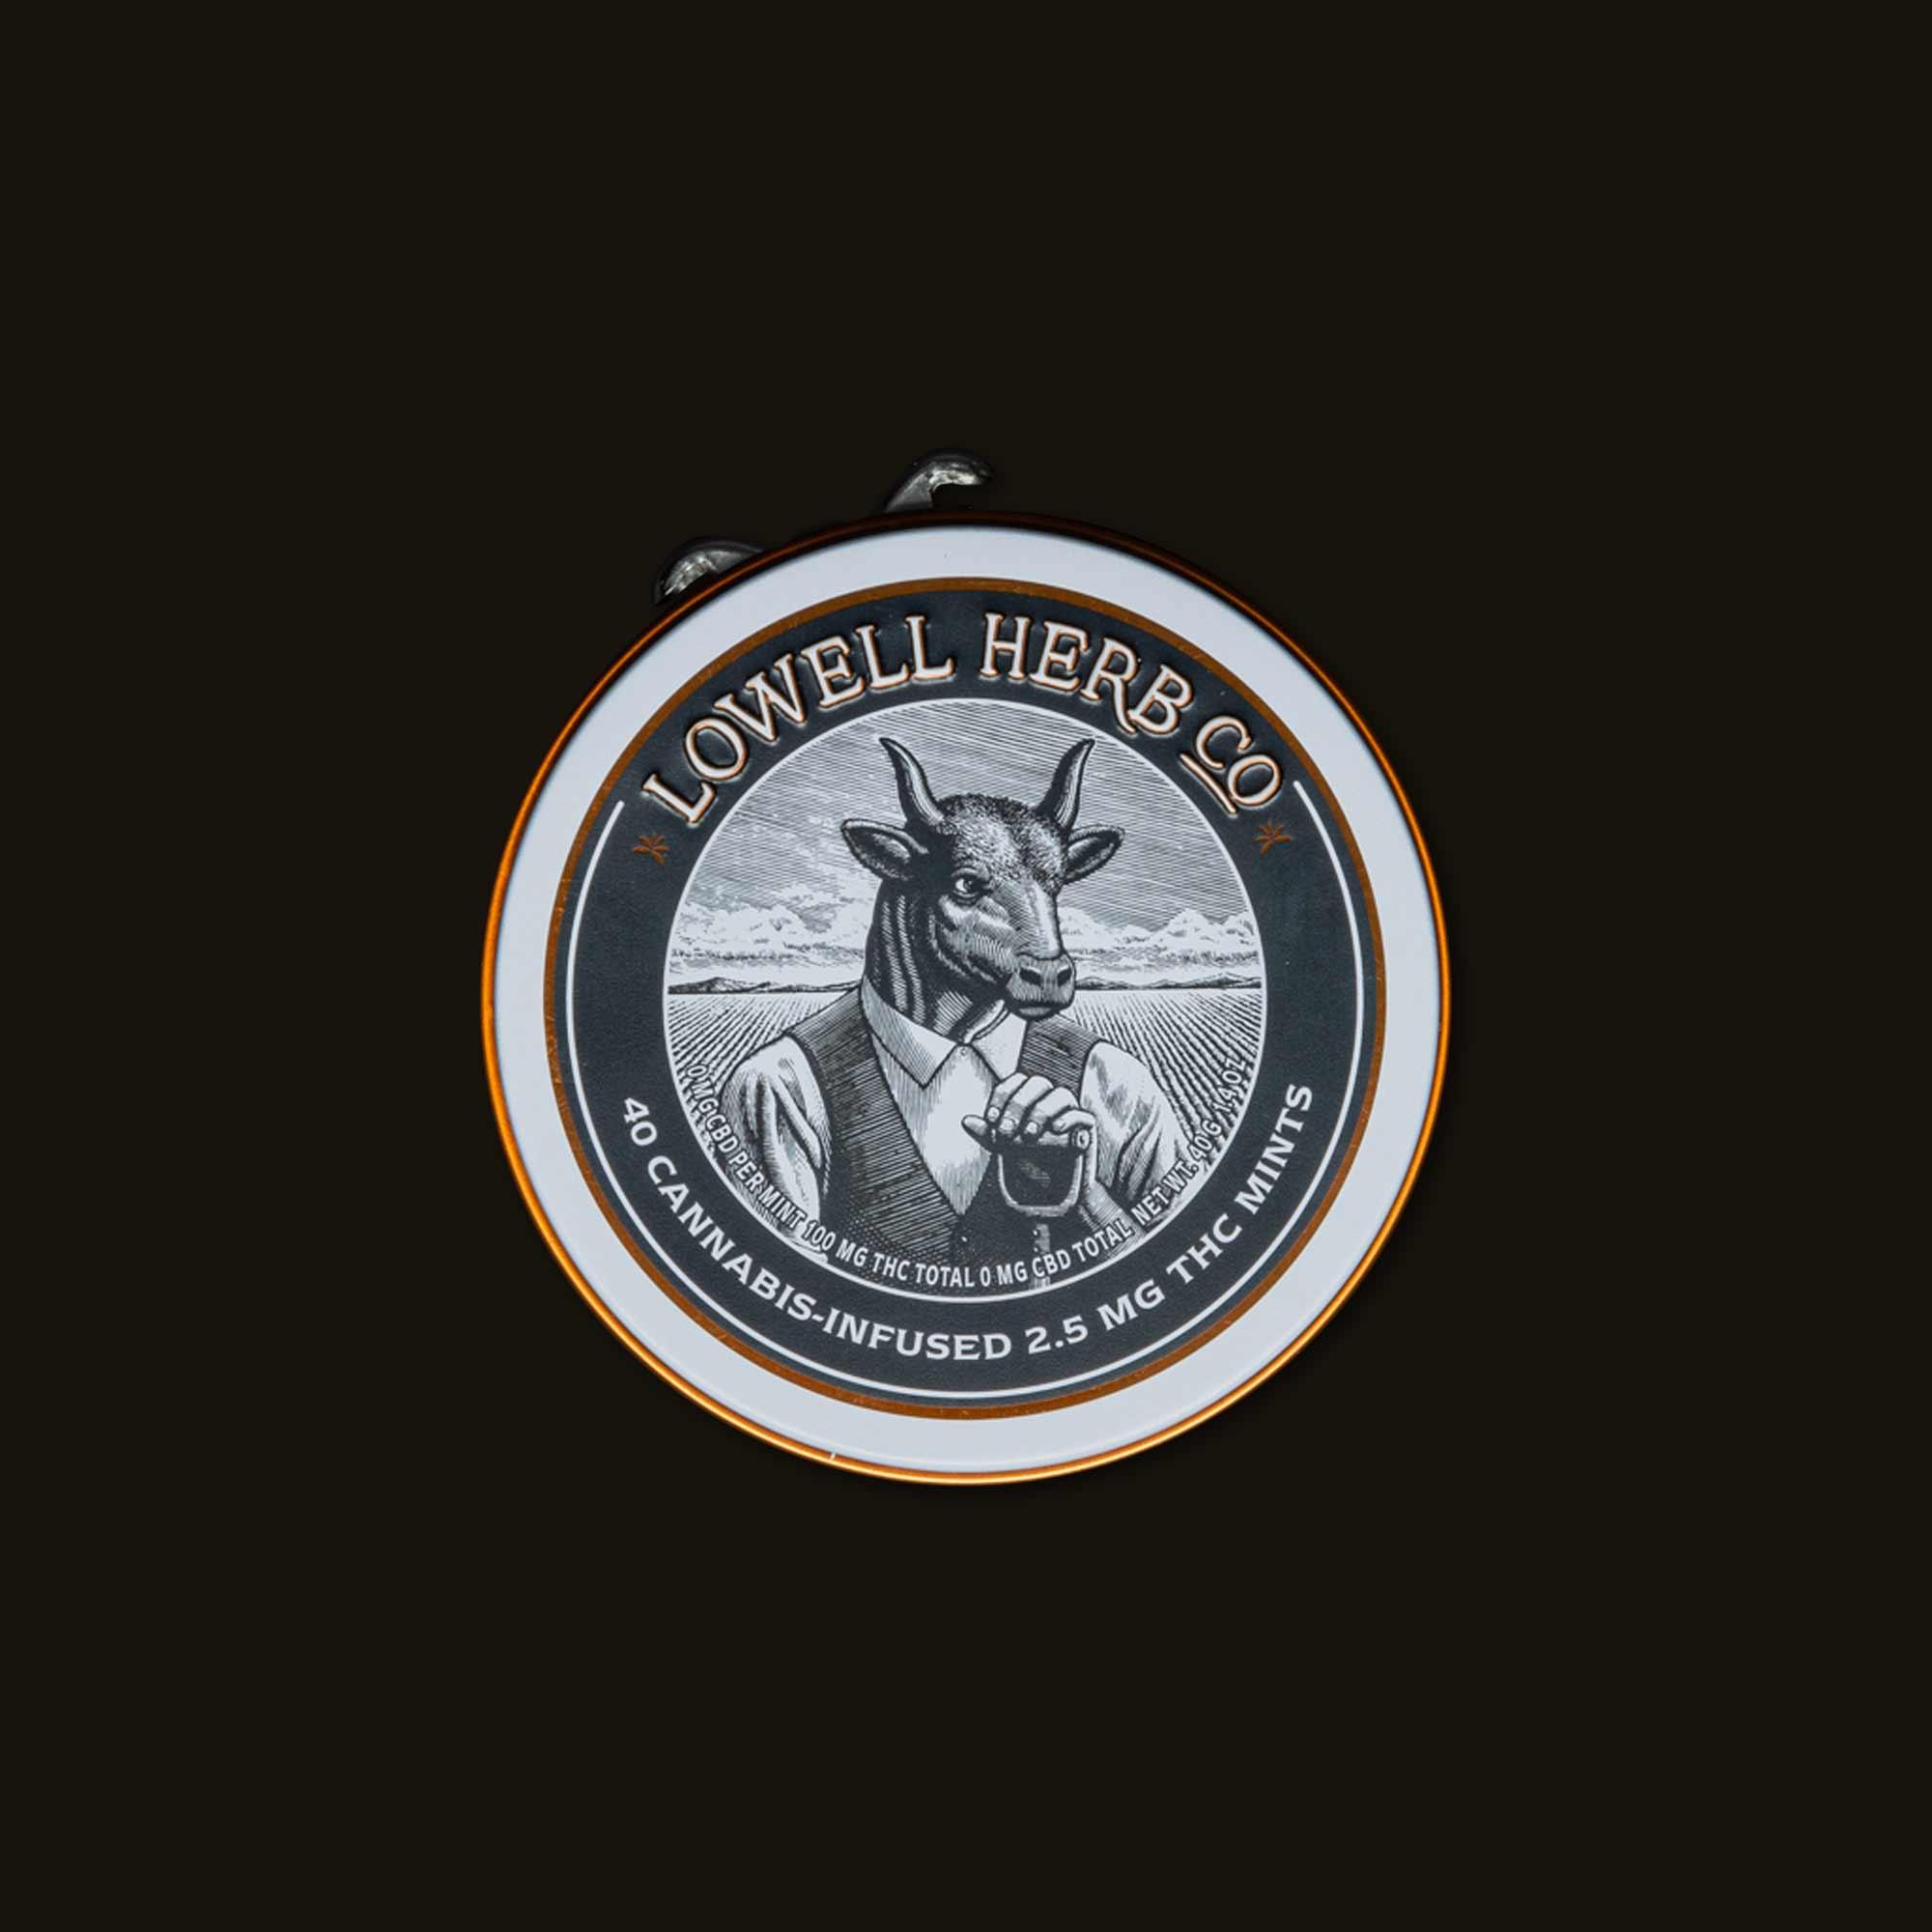 Mints - 40 mints (100mg THC)